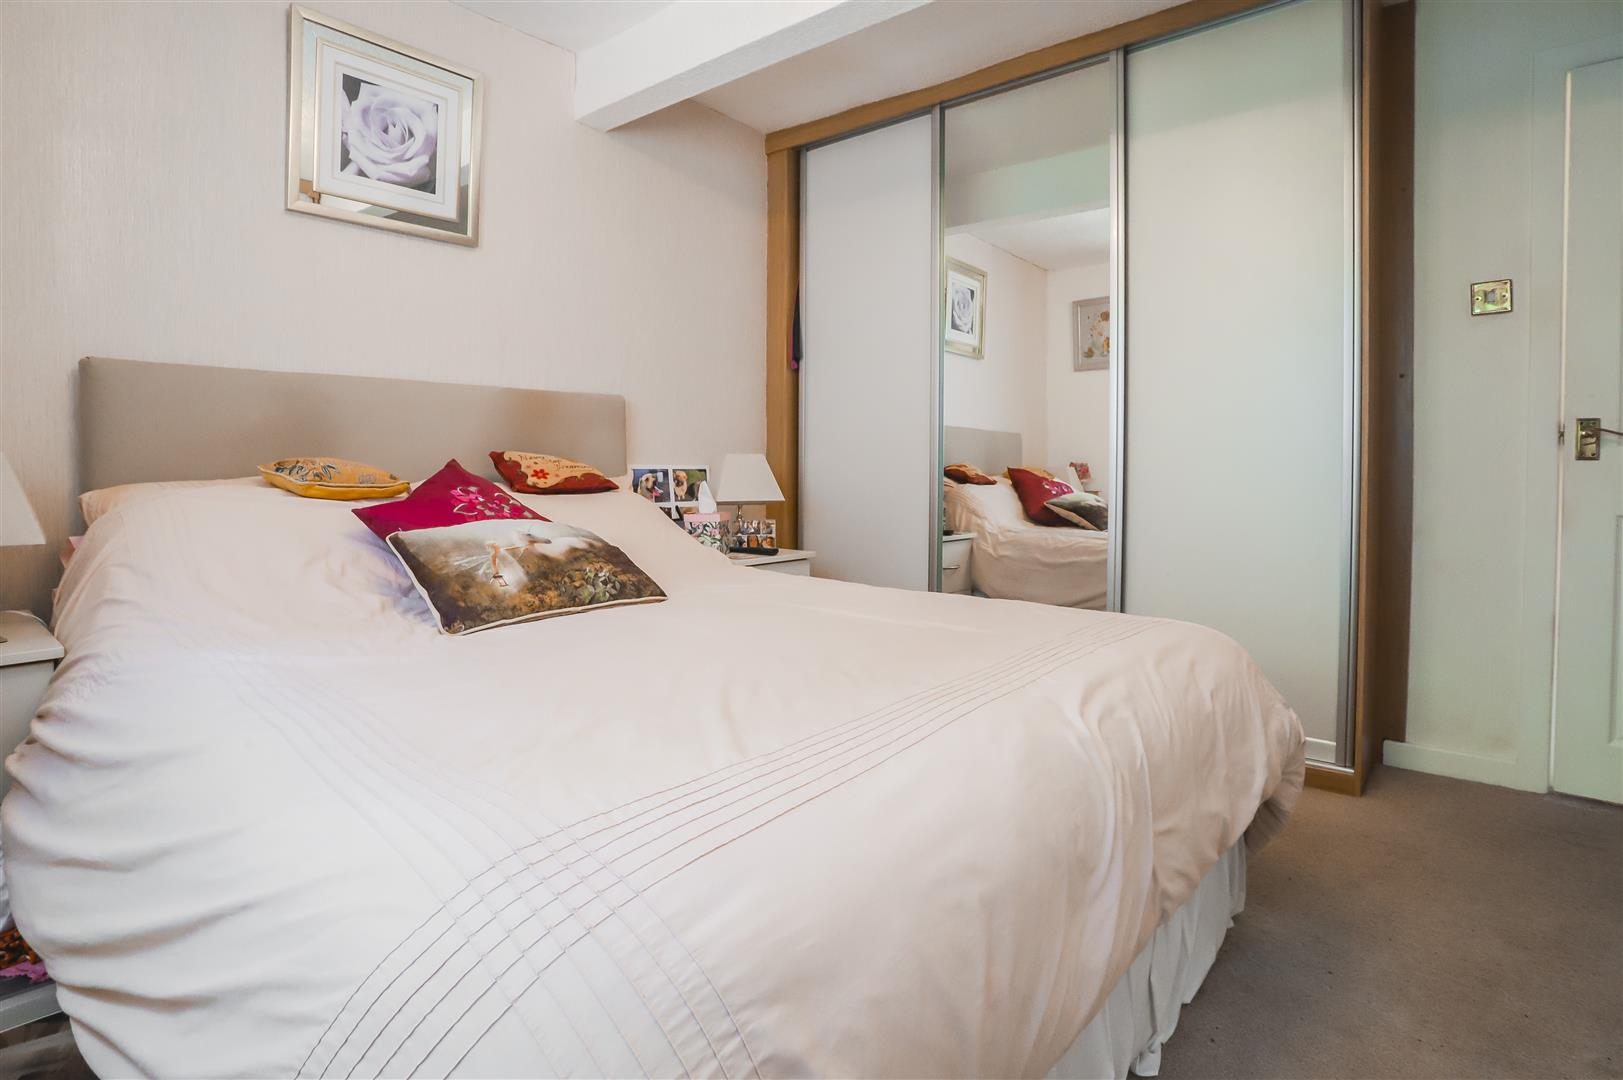 4 Bedroom Semi Detached Bungalow For Sale - Image 6